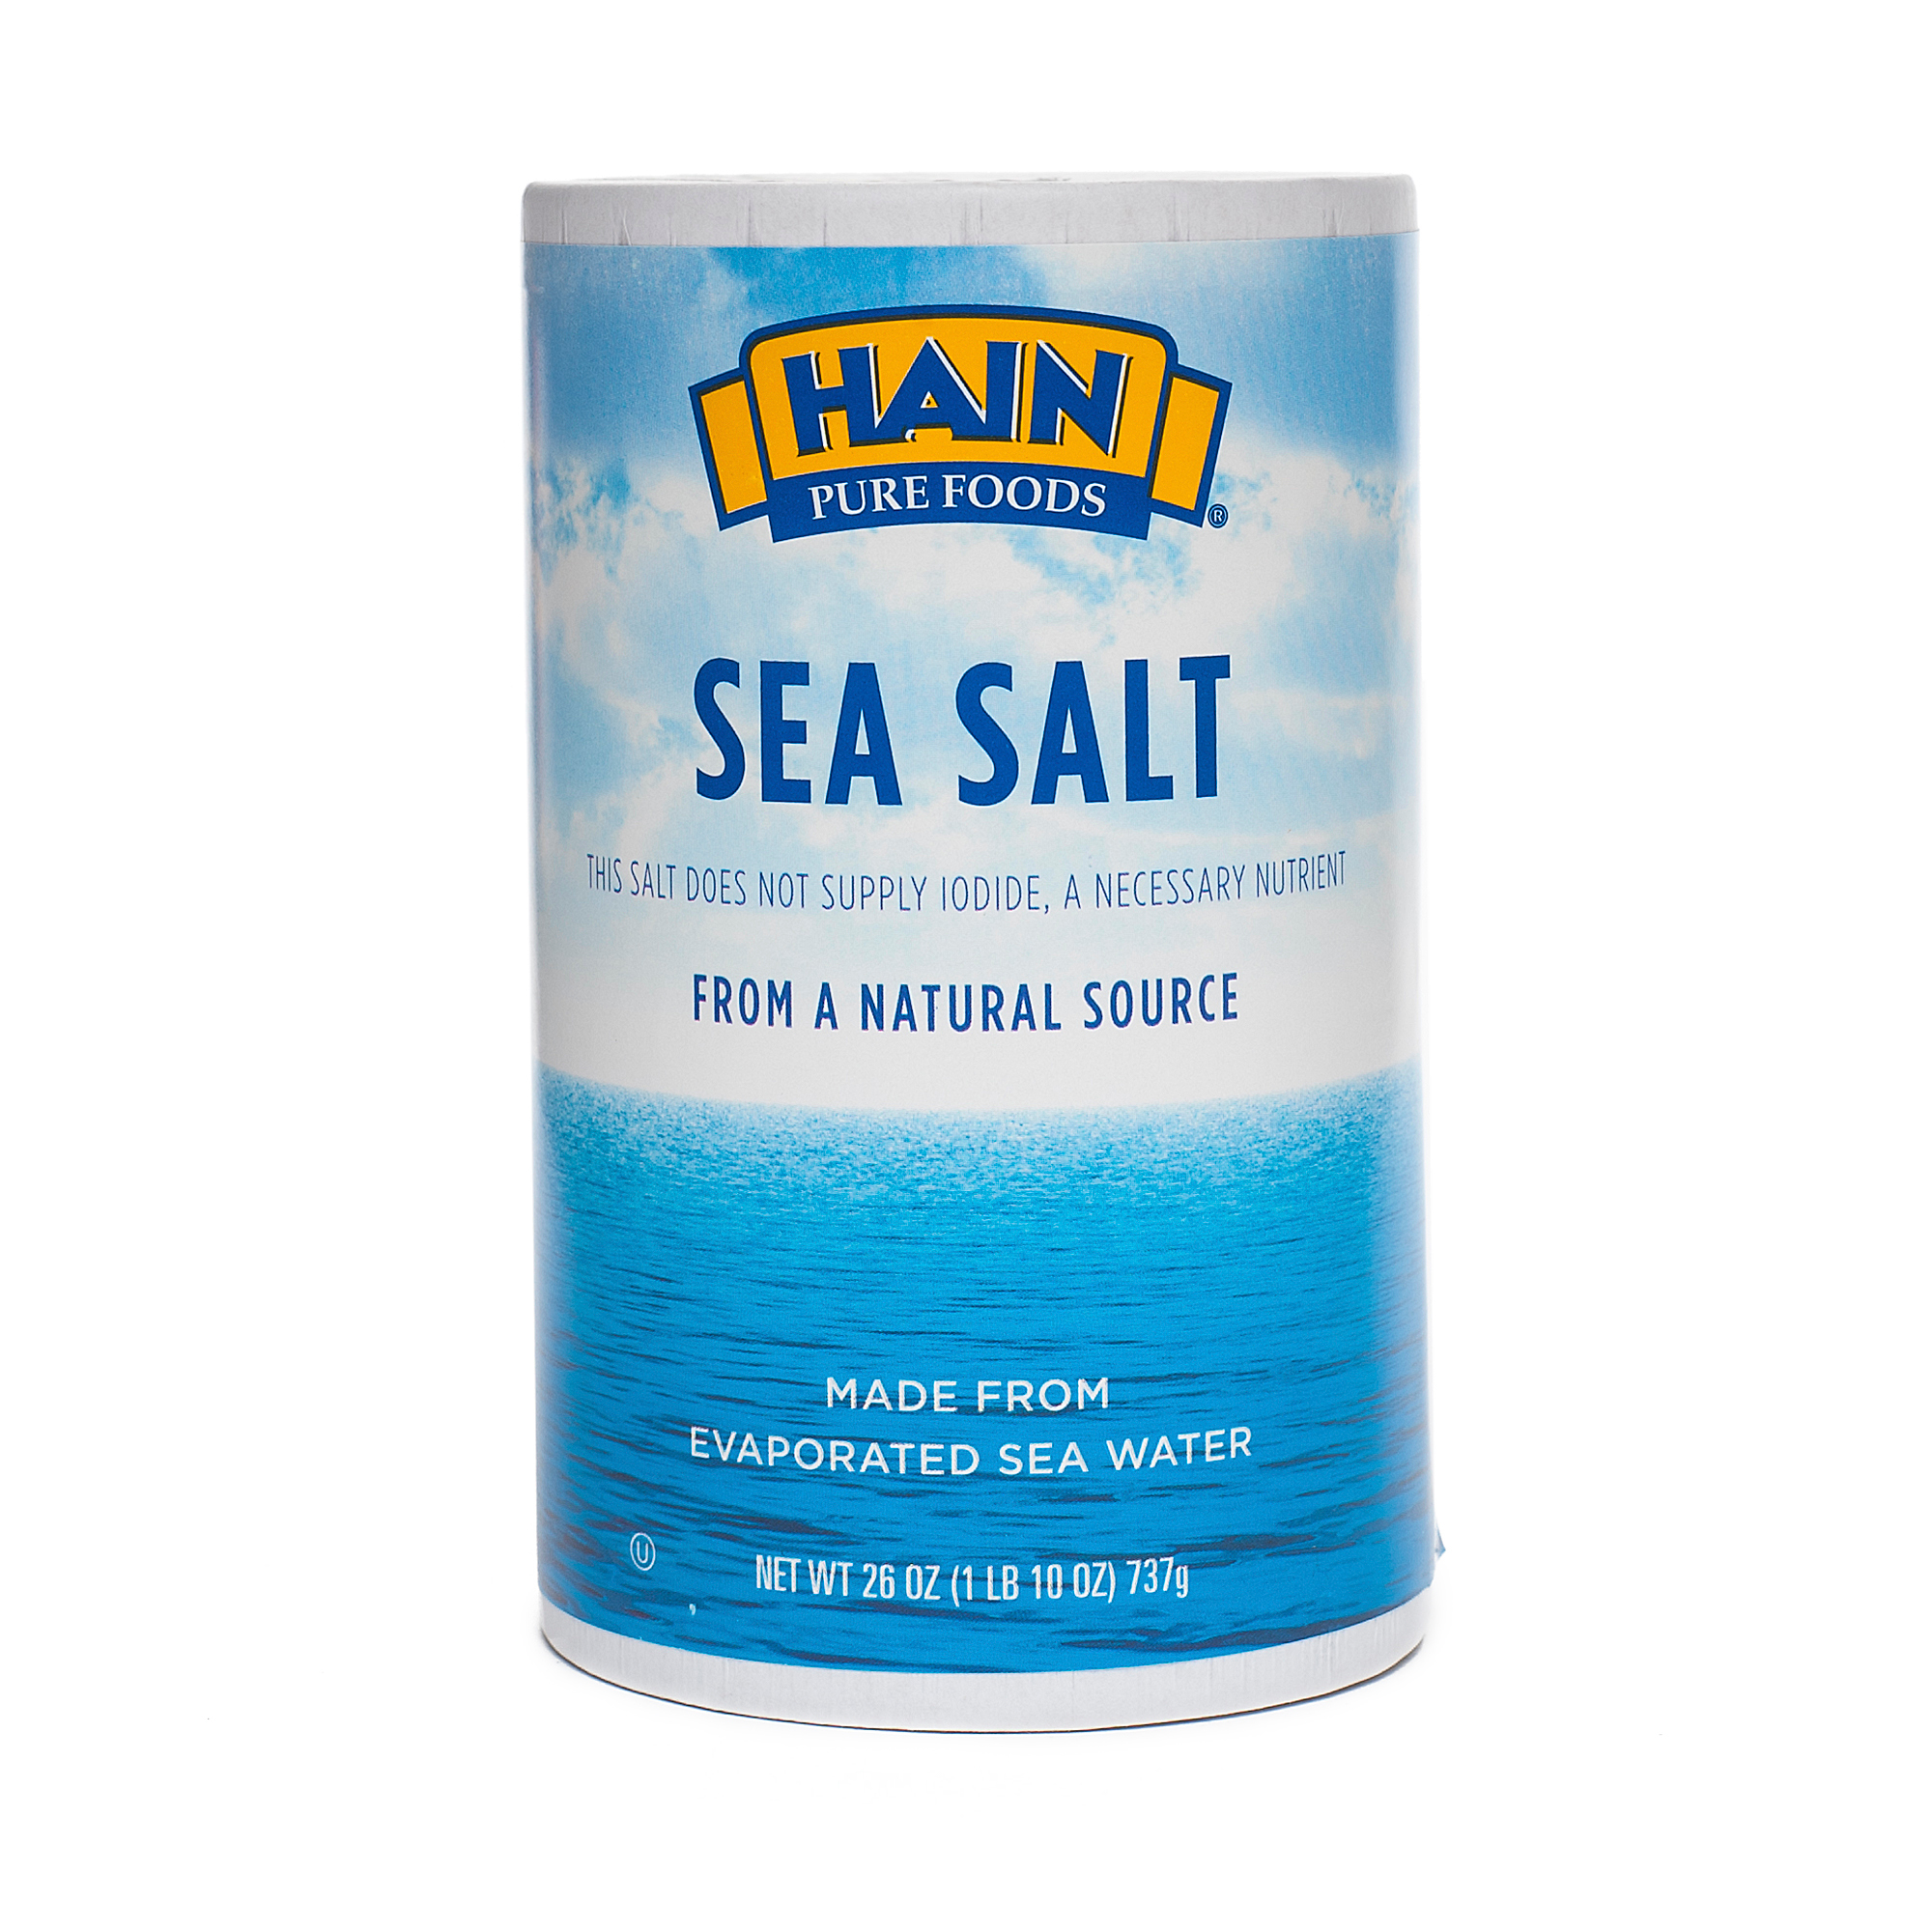 Sea Salt By Hain Pure Foods Thrive Market